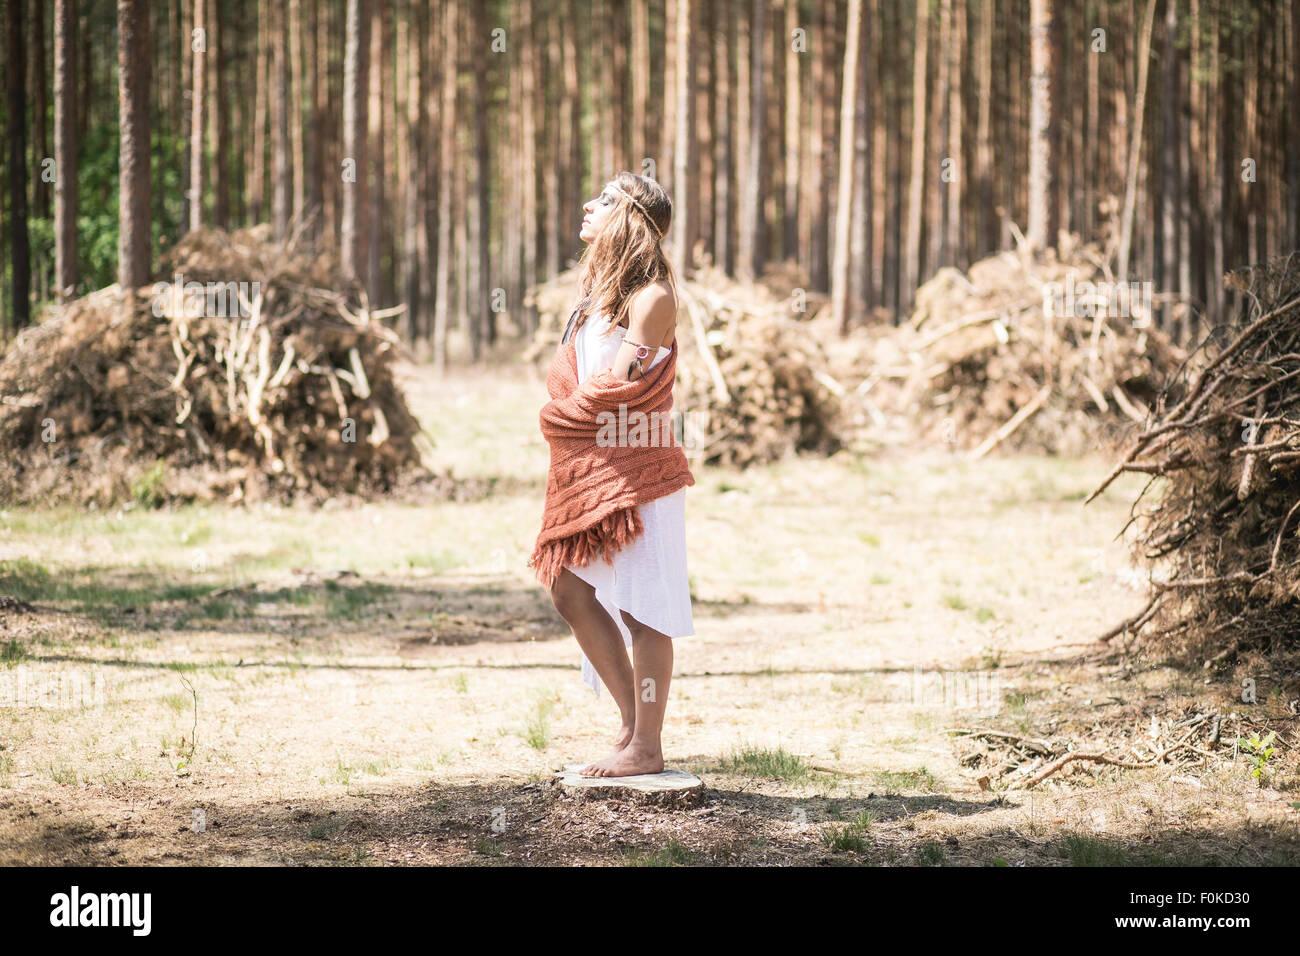 Junge Frau, die in den Wäldern genießen Ruhe Stockbild